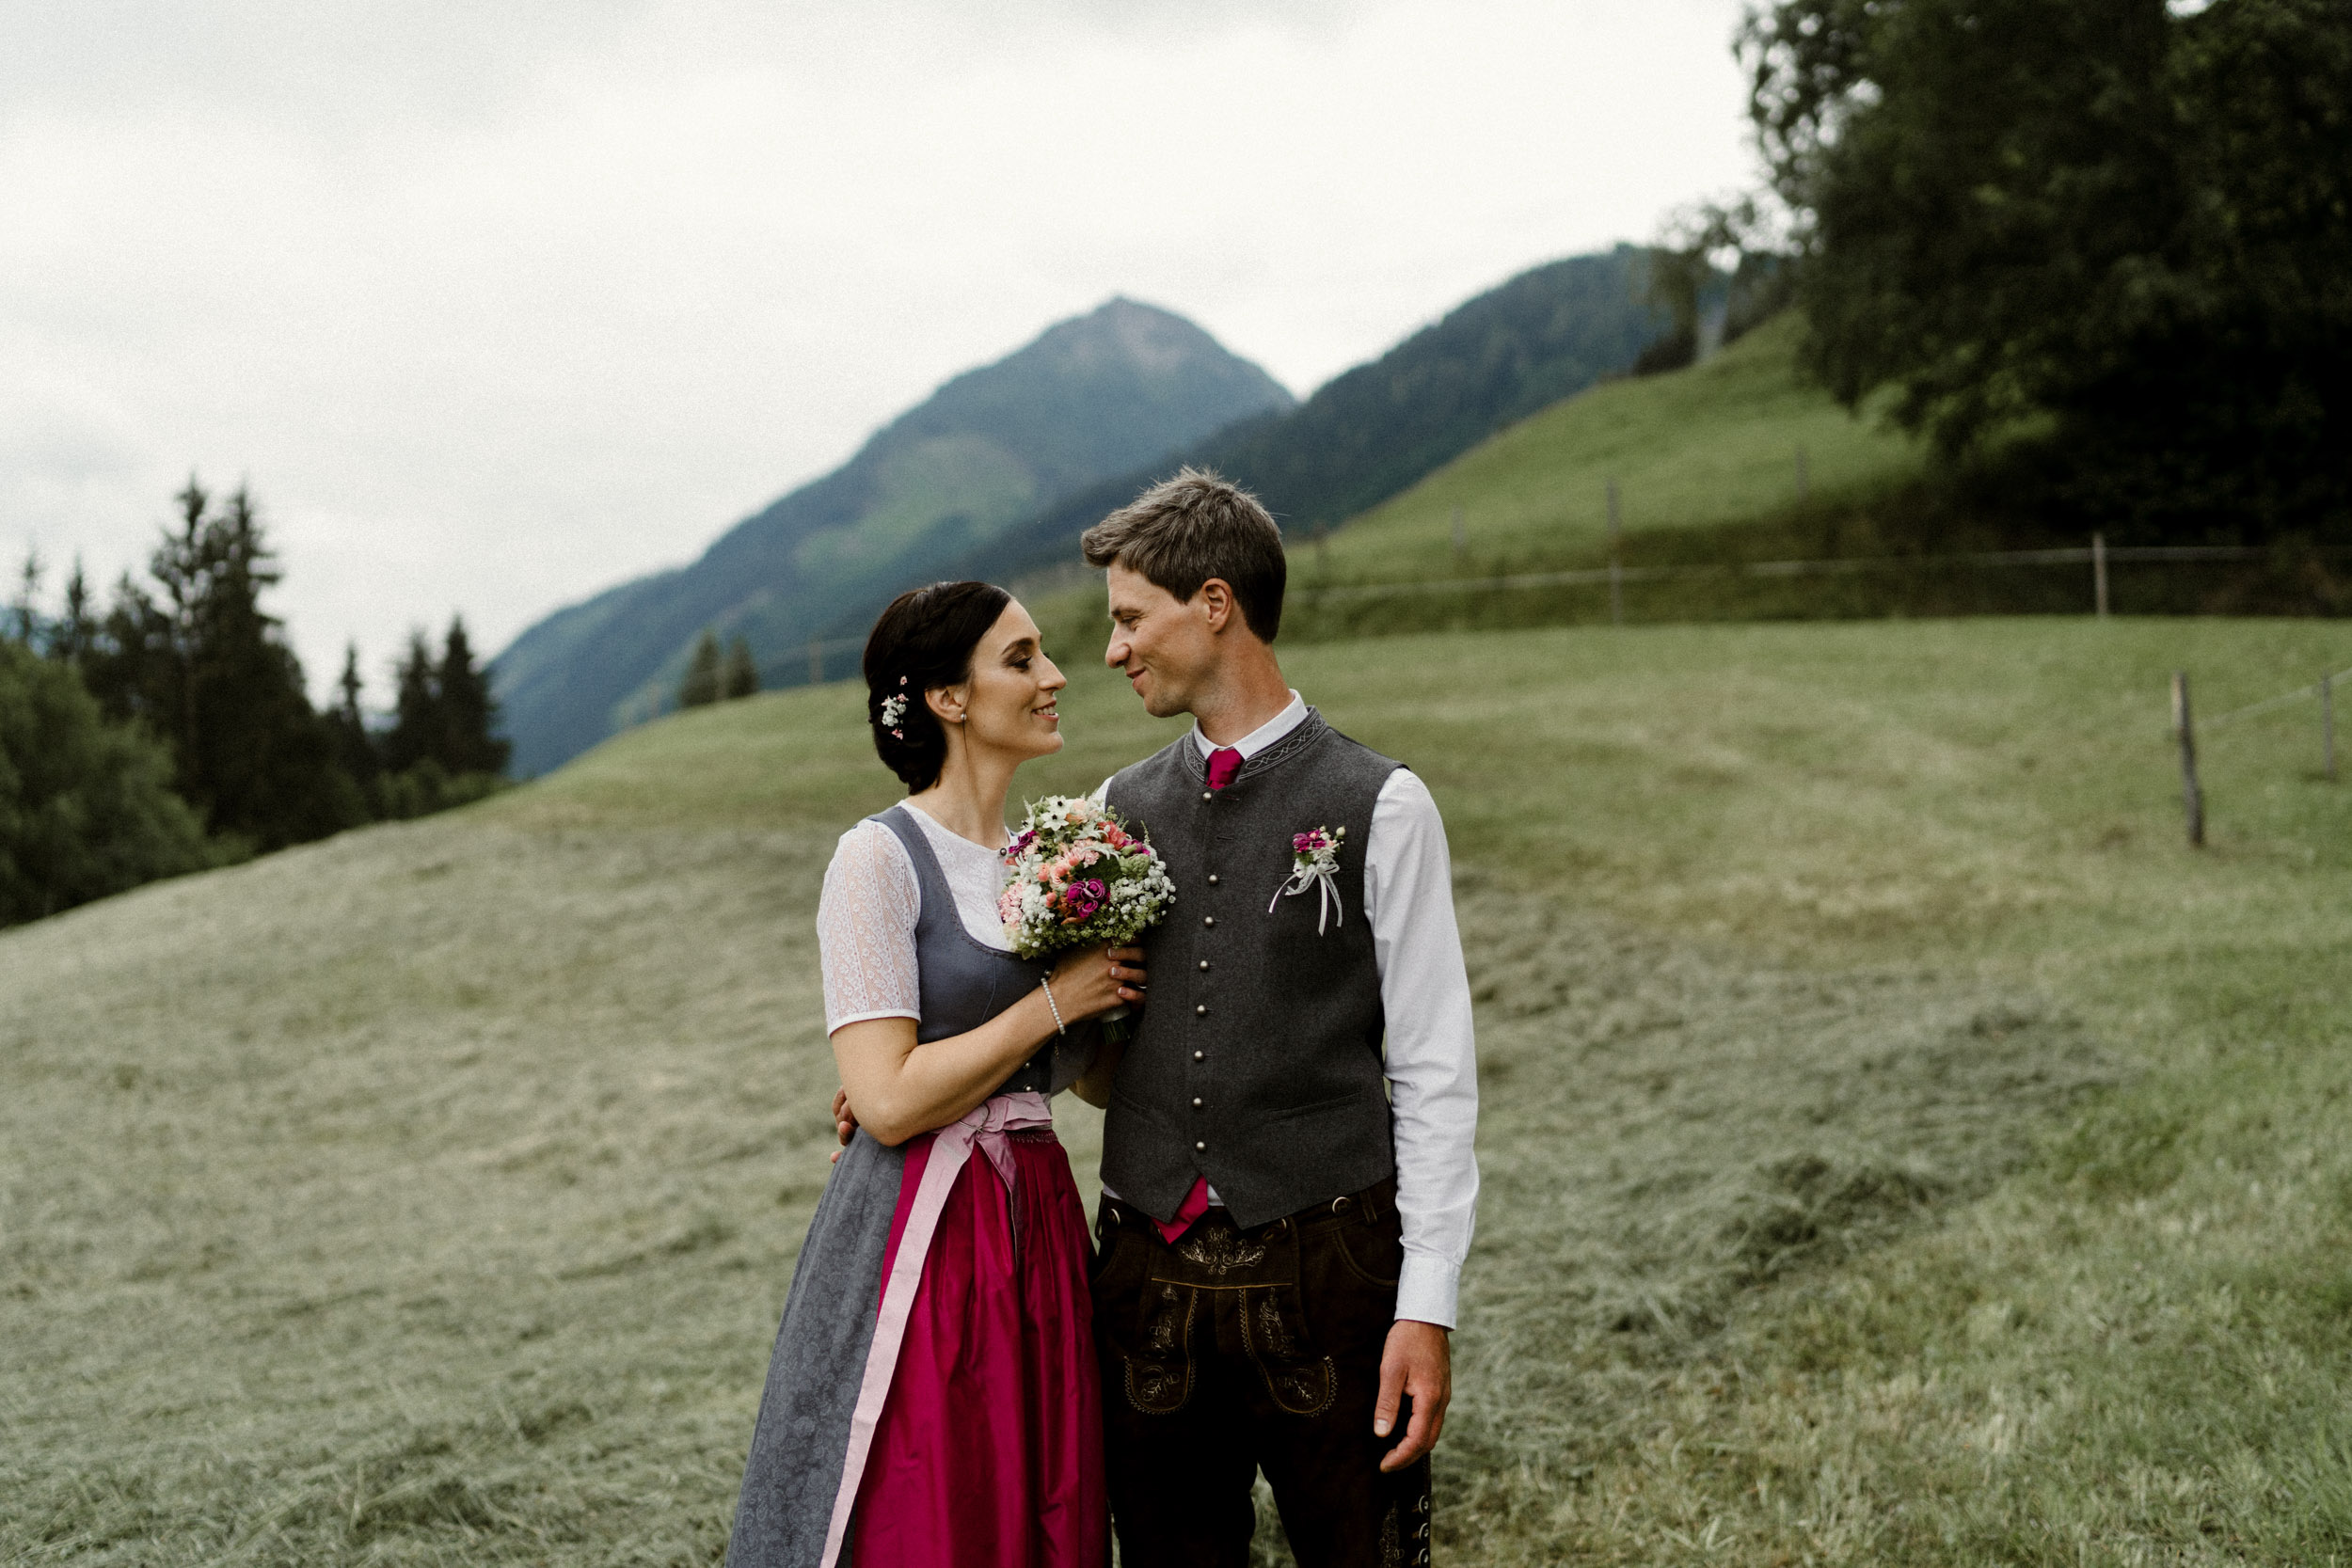 austria_mountain_wedding_photography_countryside_vienna-20.jpg